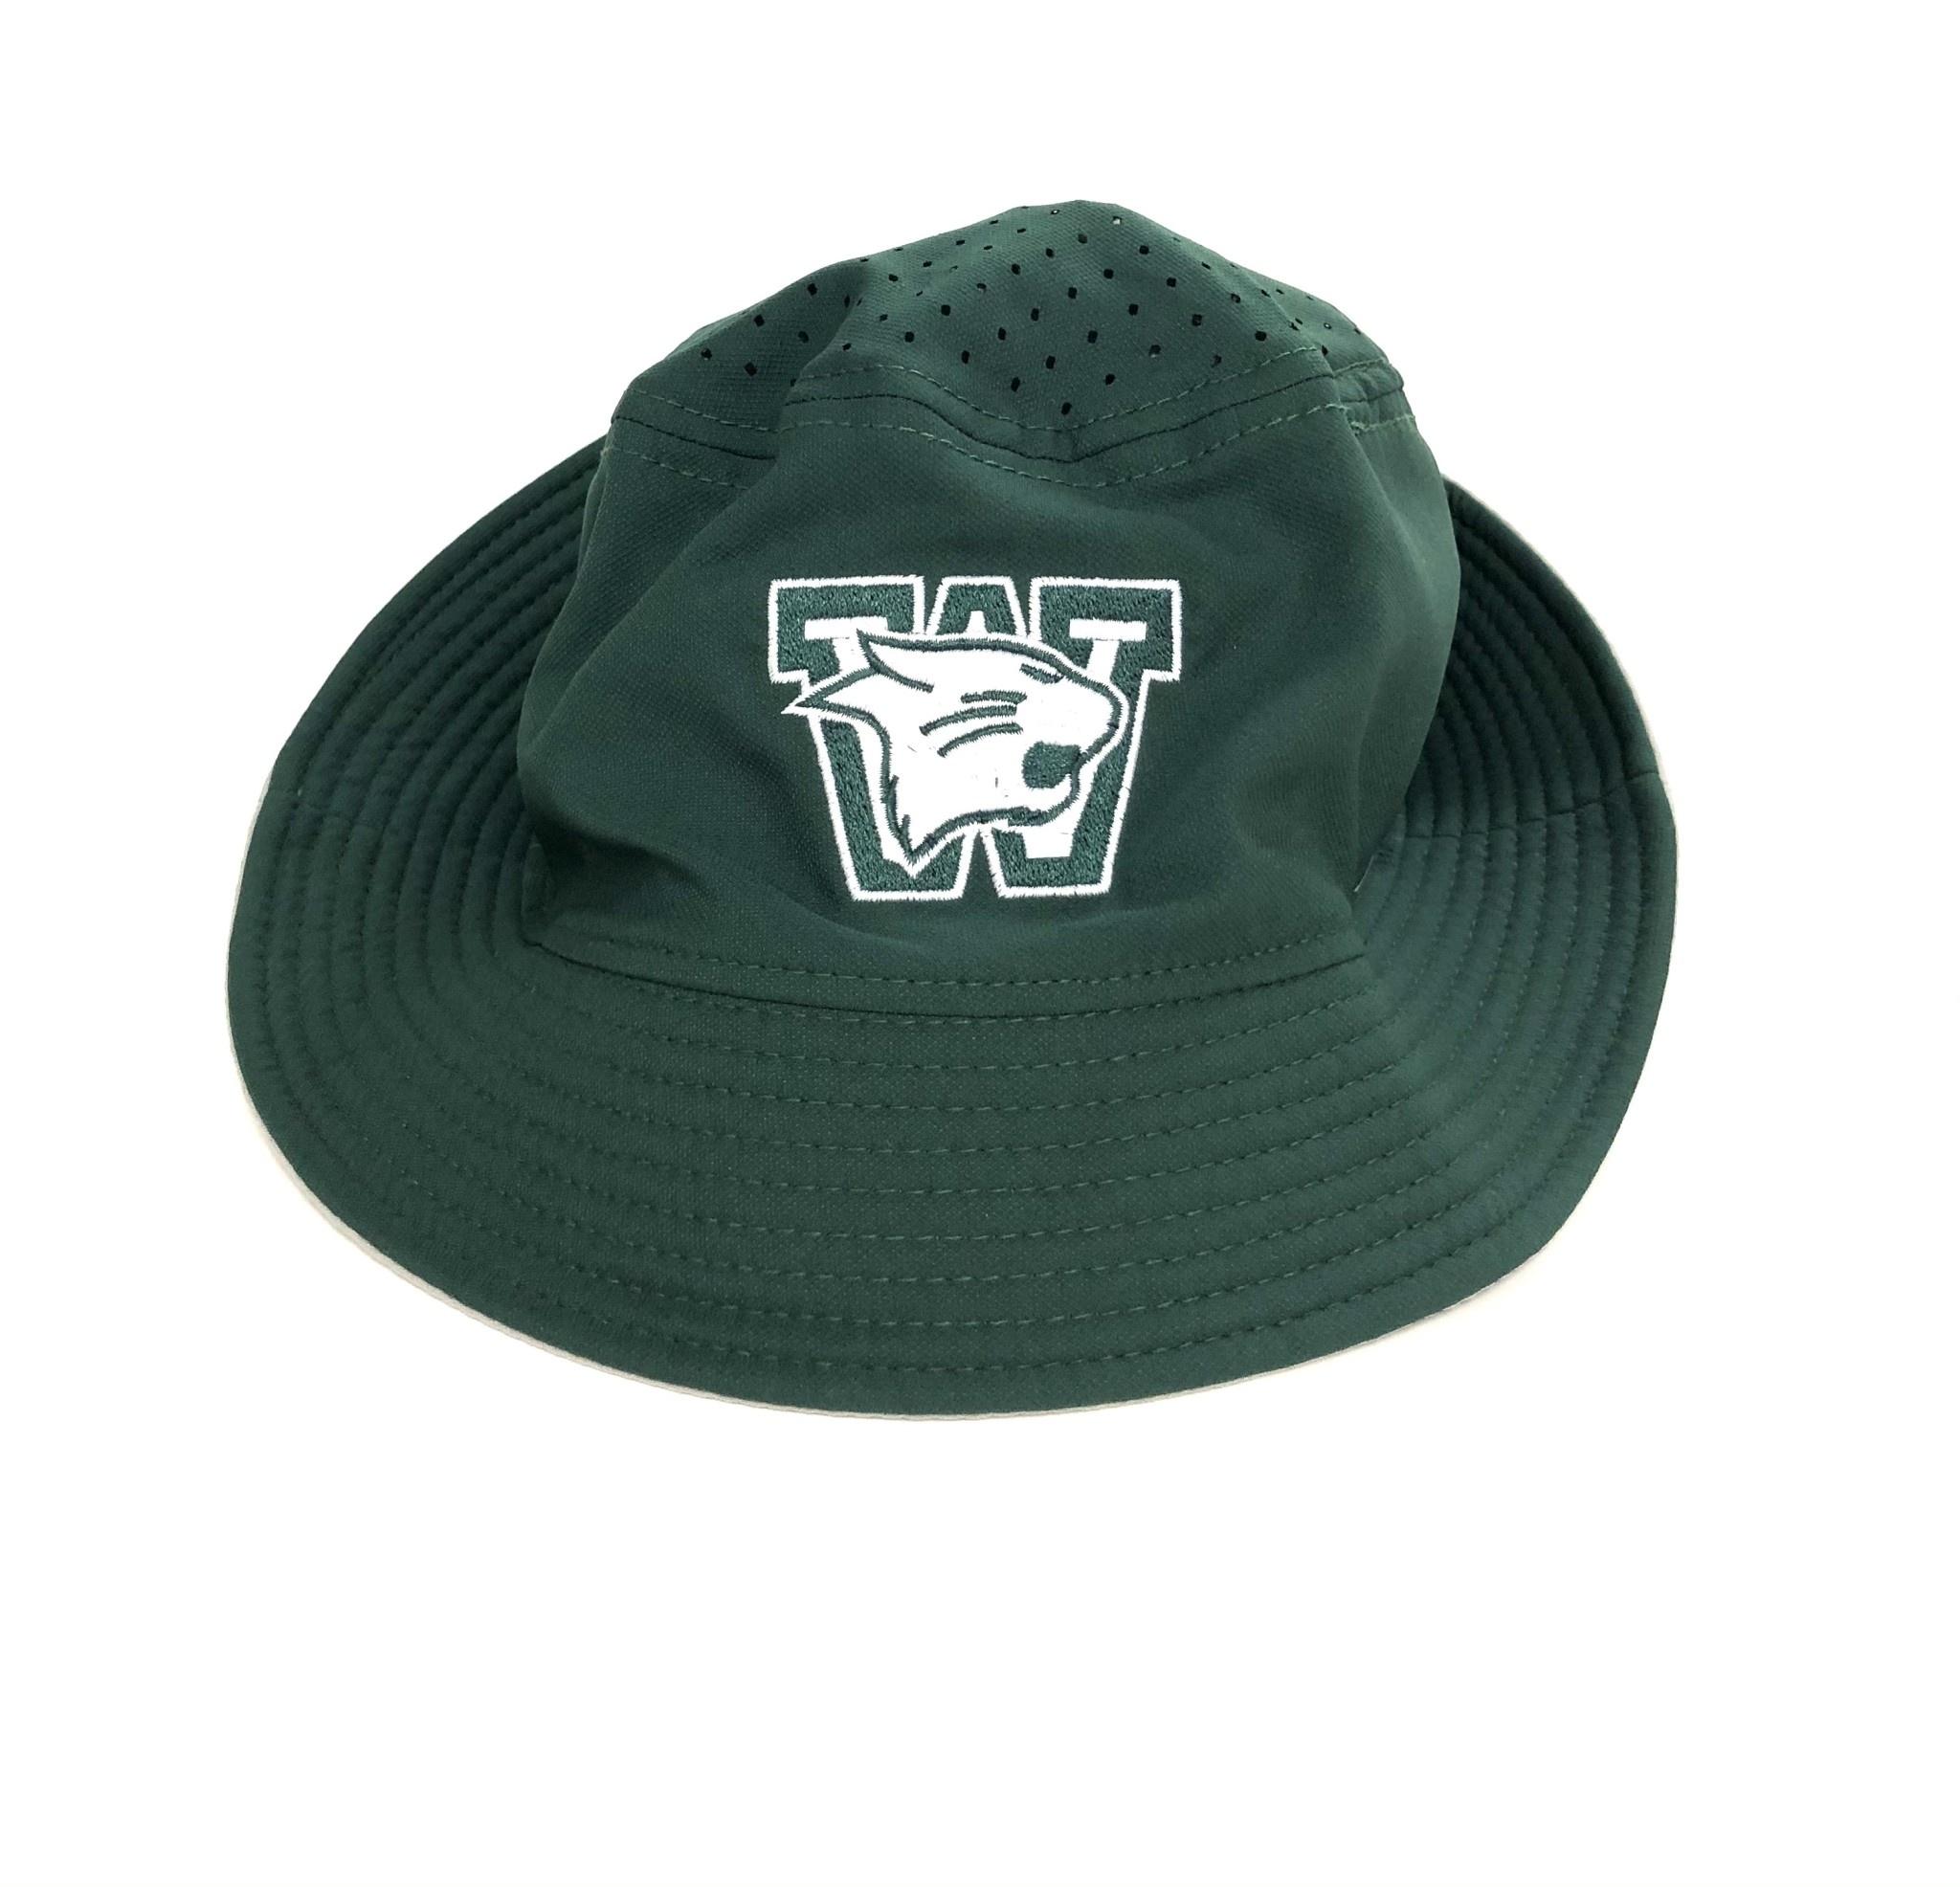 Nike Hat: Nike Performance Bucket Cap